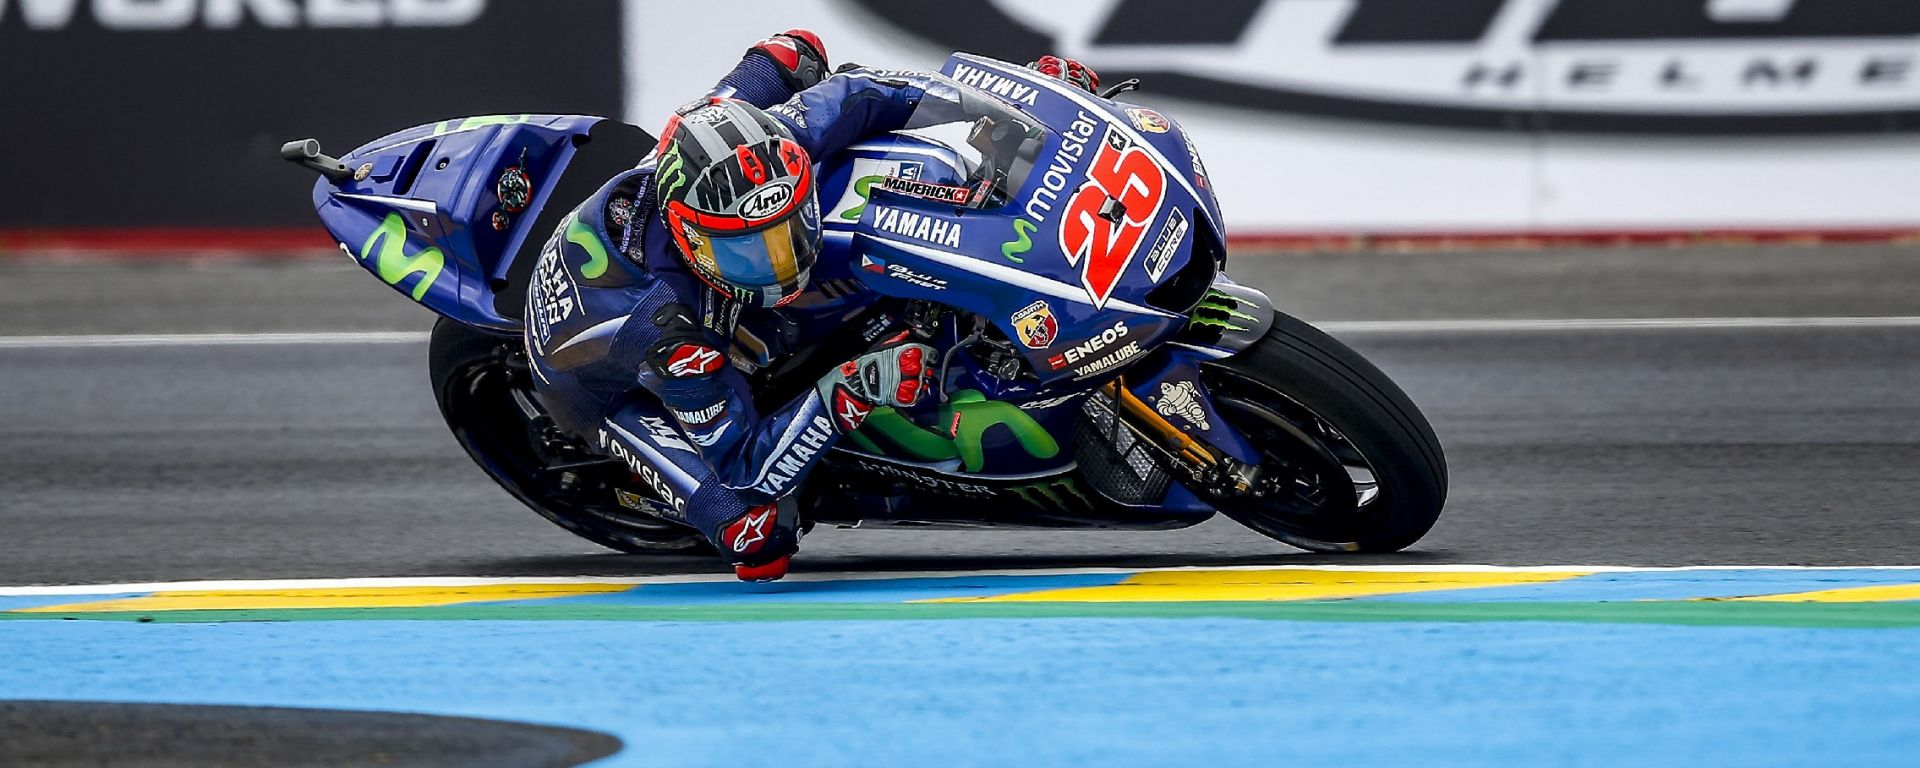 MotoGP Francia 2017: Maverick Vinales centra la pole davanti a Valentino Rossi e Johann Zarcò